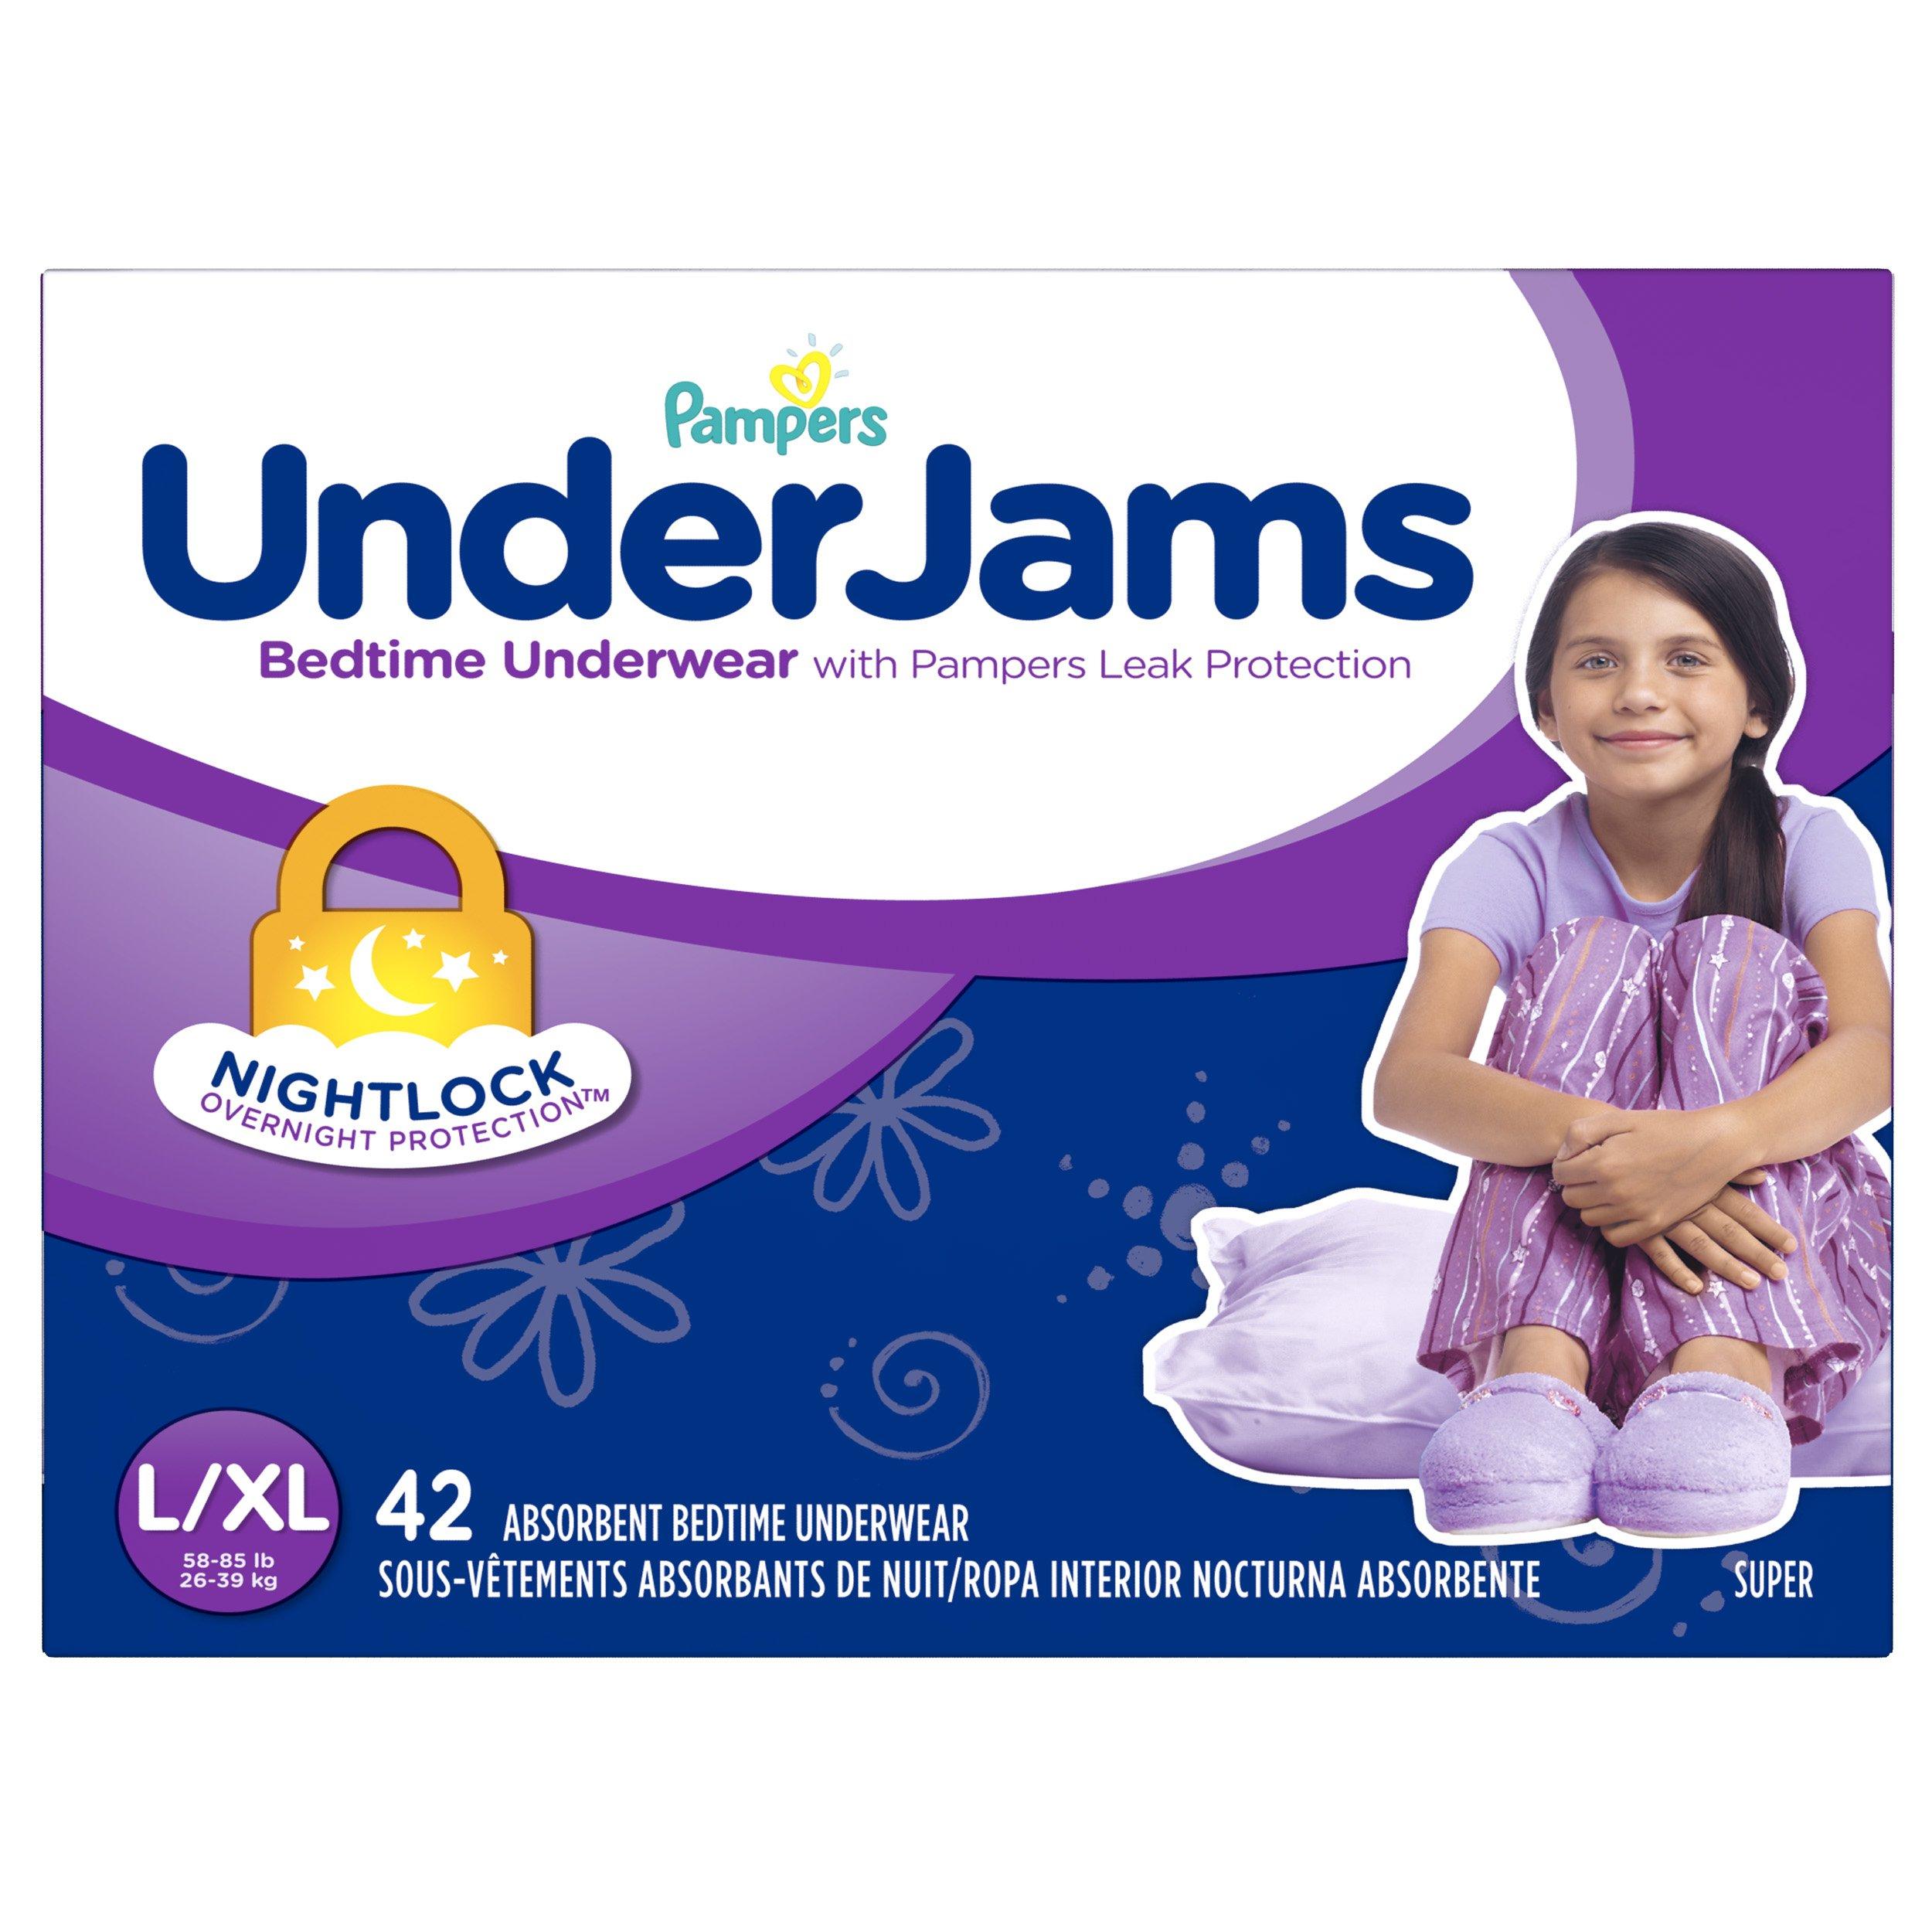 Pampers Underjams 女宝宝床上用品,小号/中号尿布,50 片 大号/加大号,42 只装 L/X-L 42